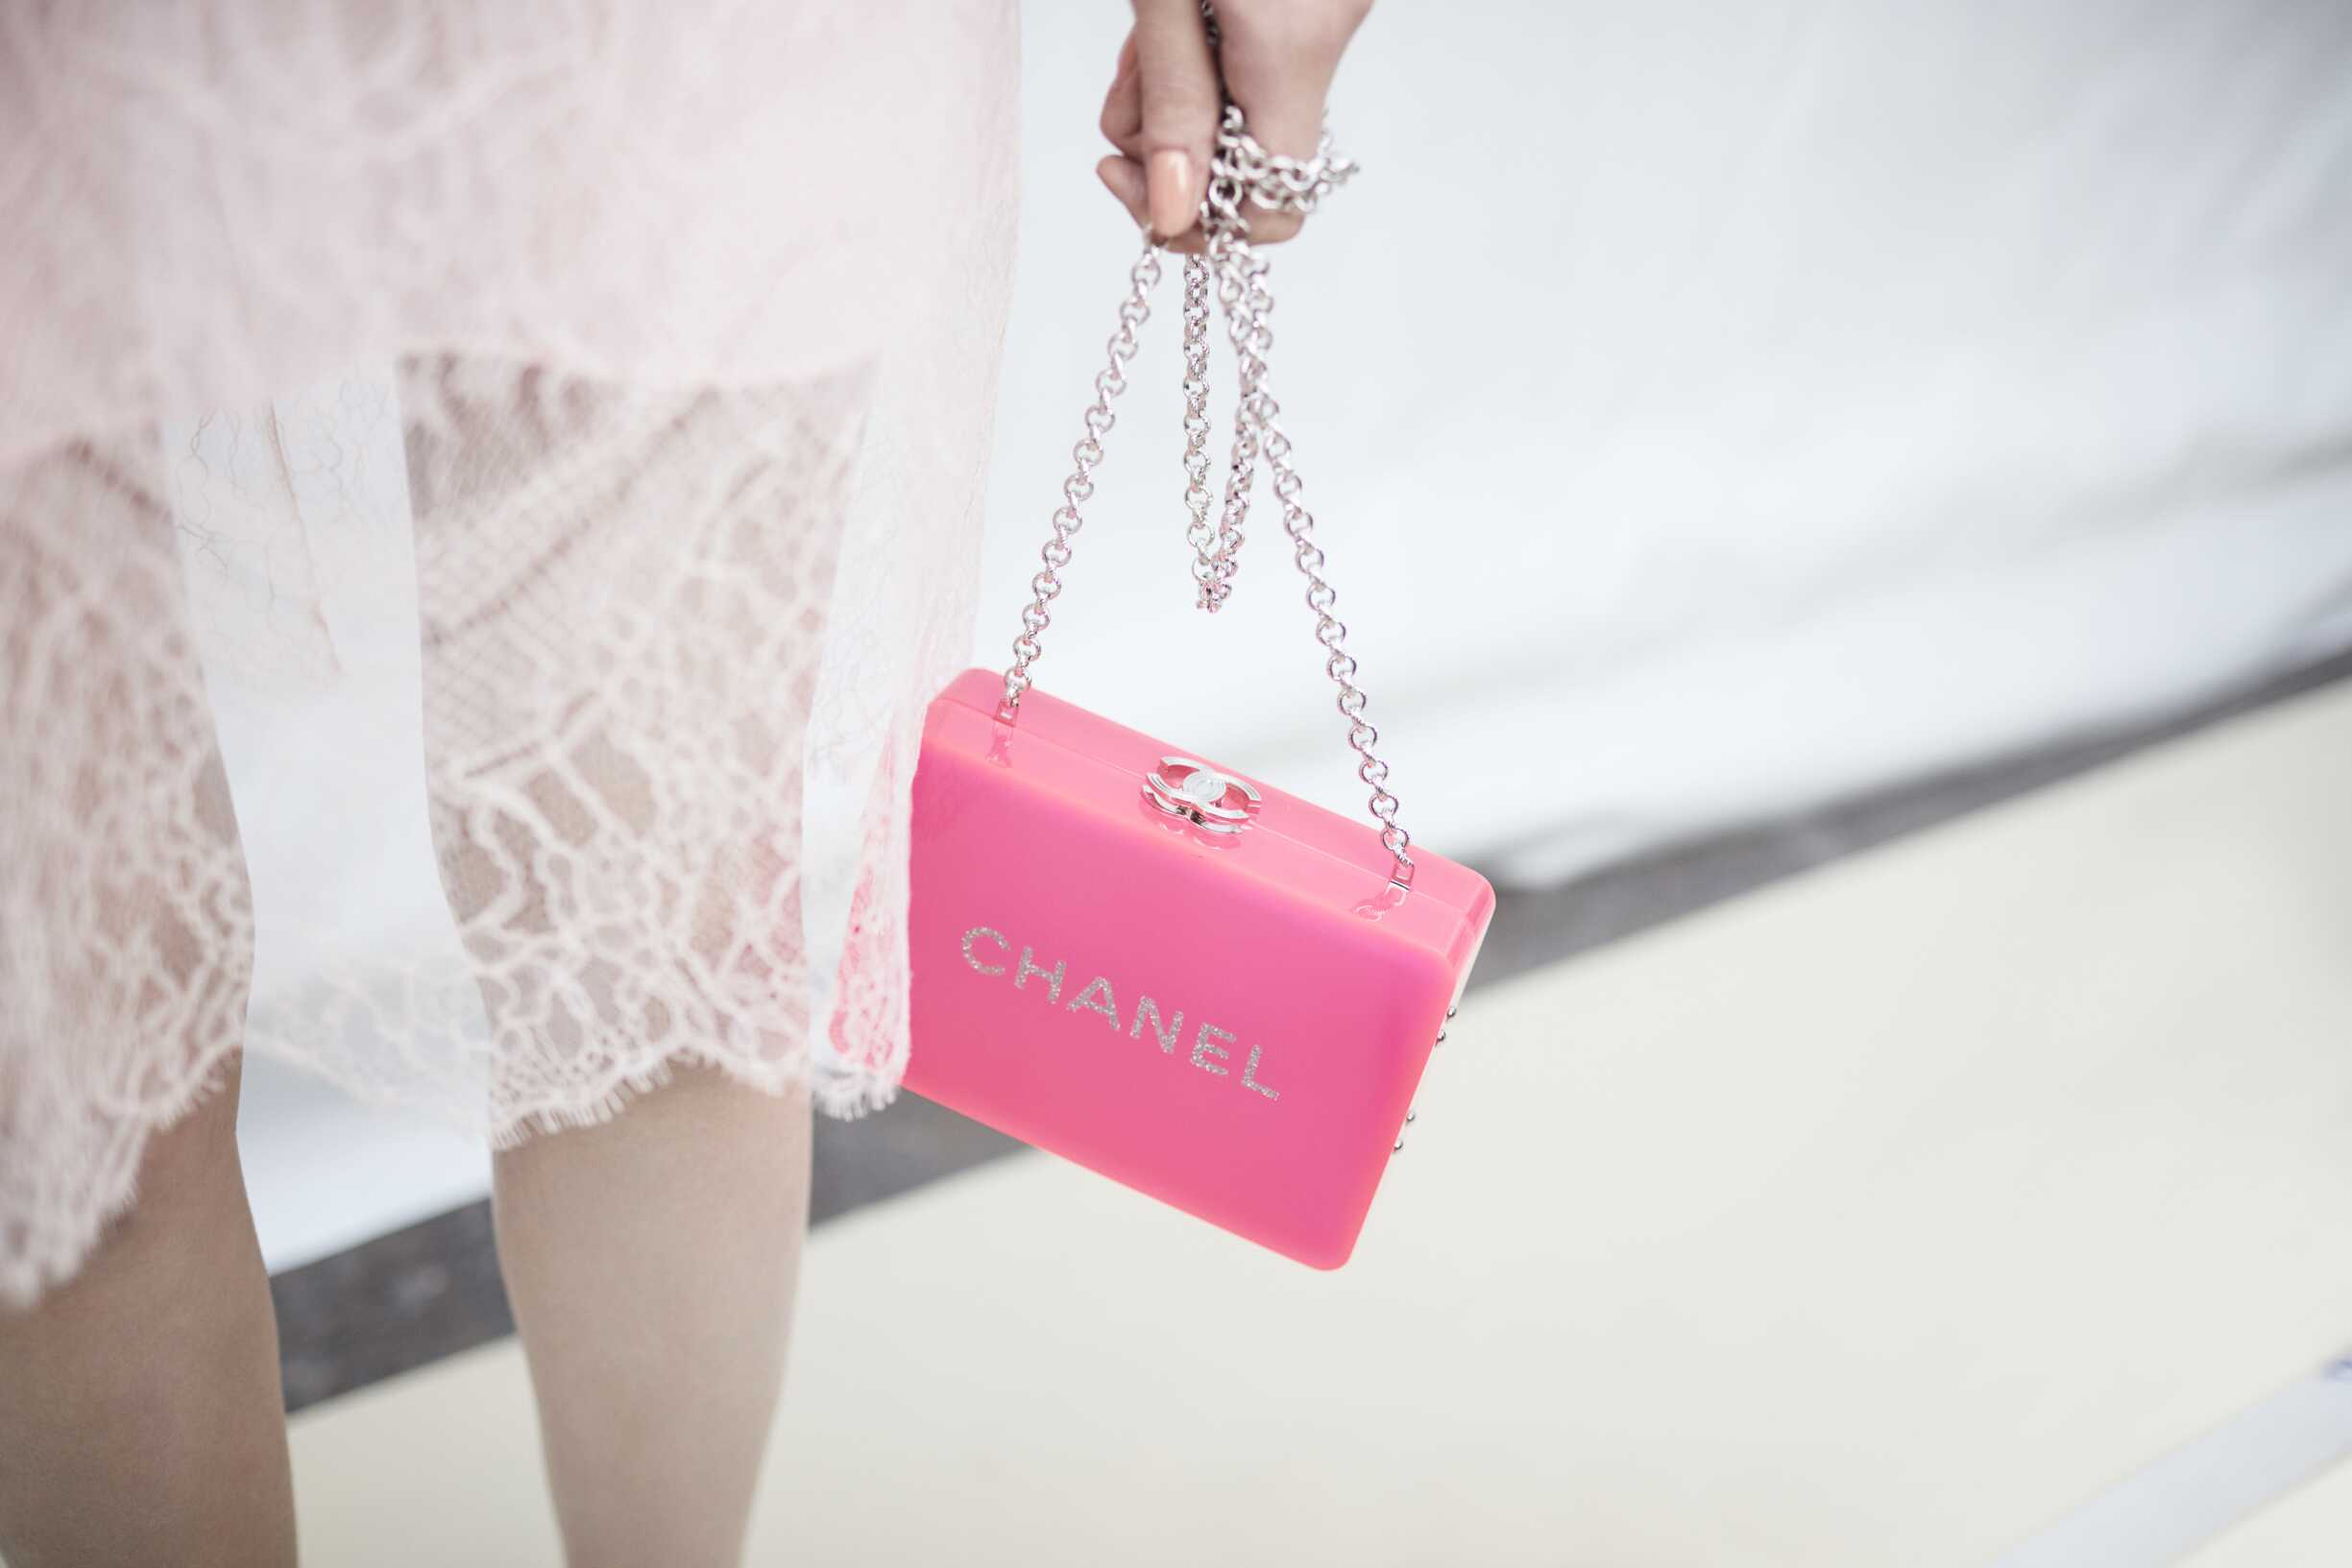 56c5e2b2495 Bag 2017 Womenswear Chanel